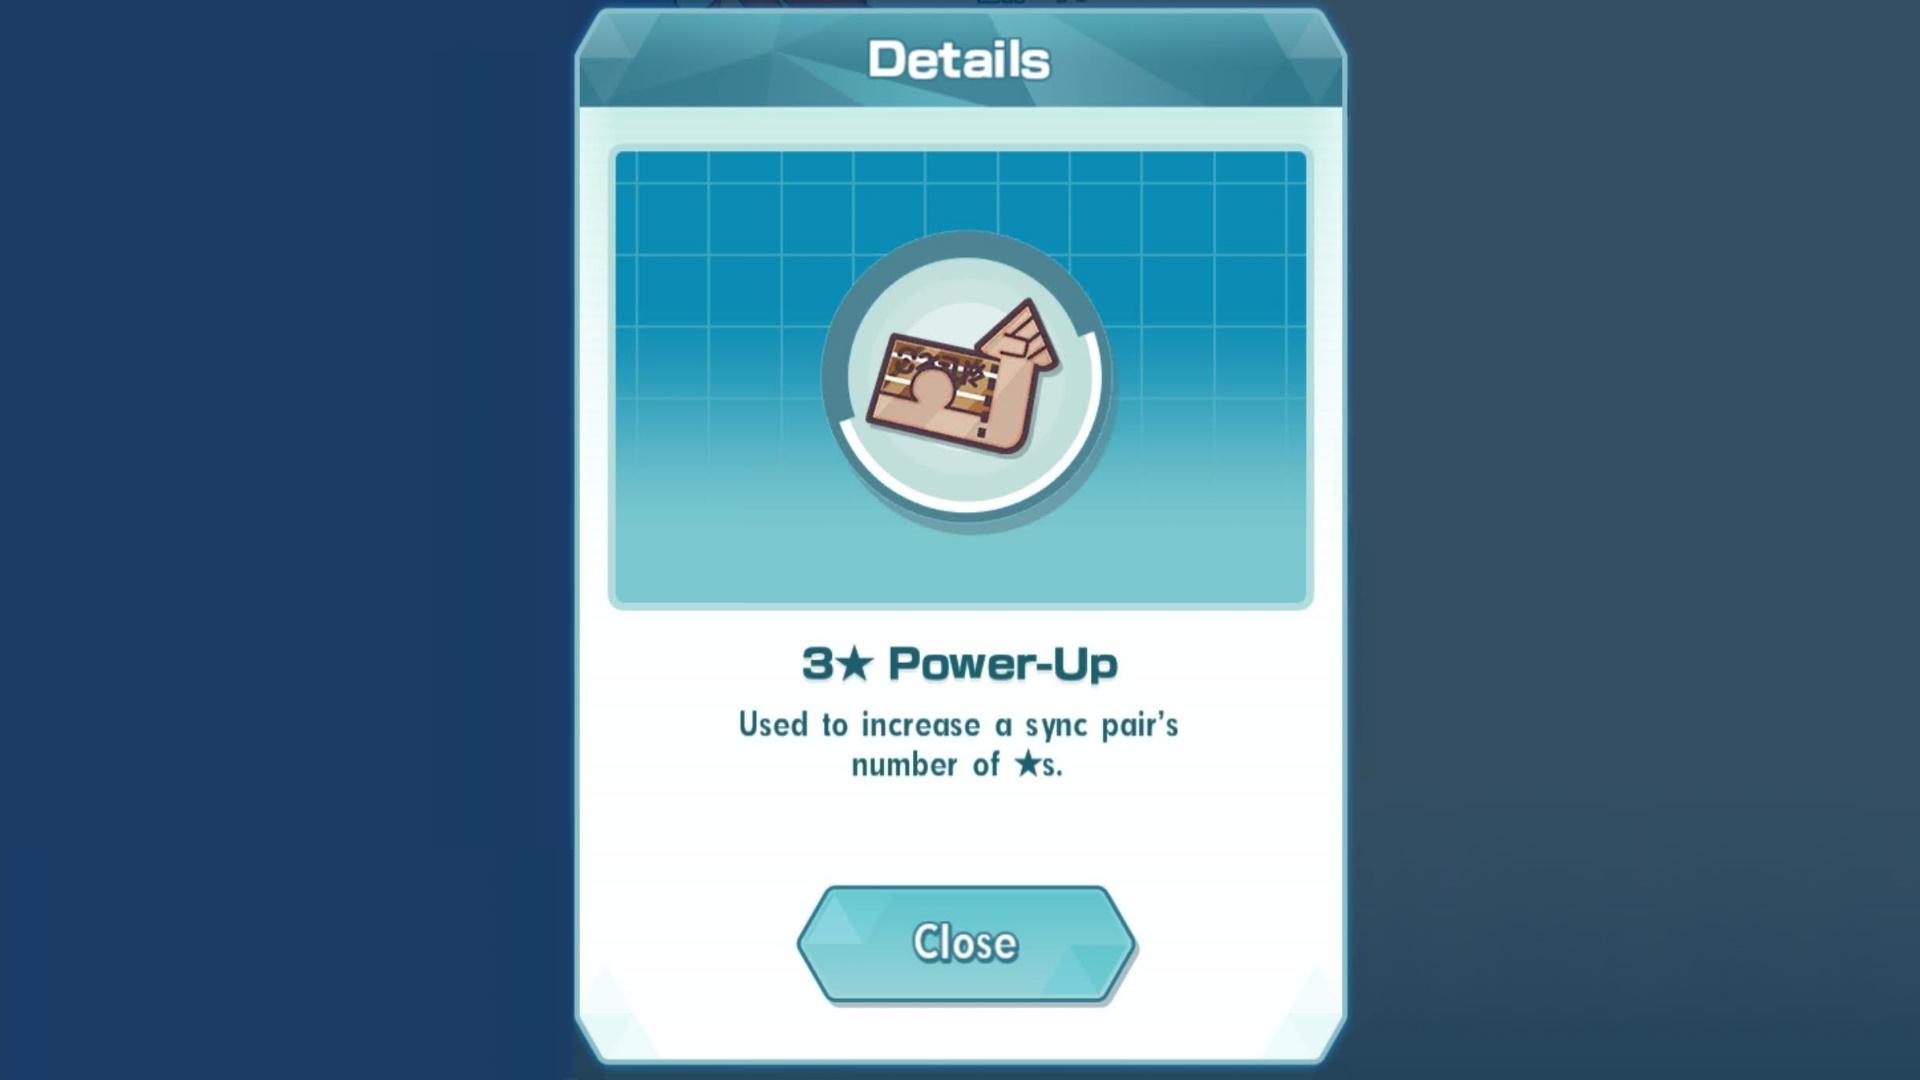 Pokemon masters star power up